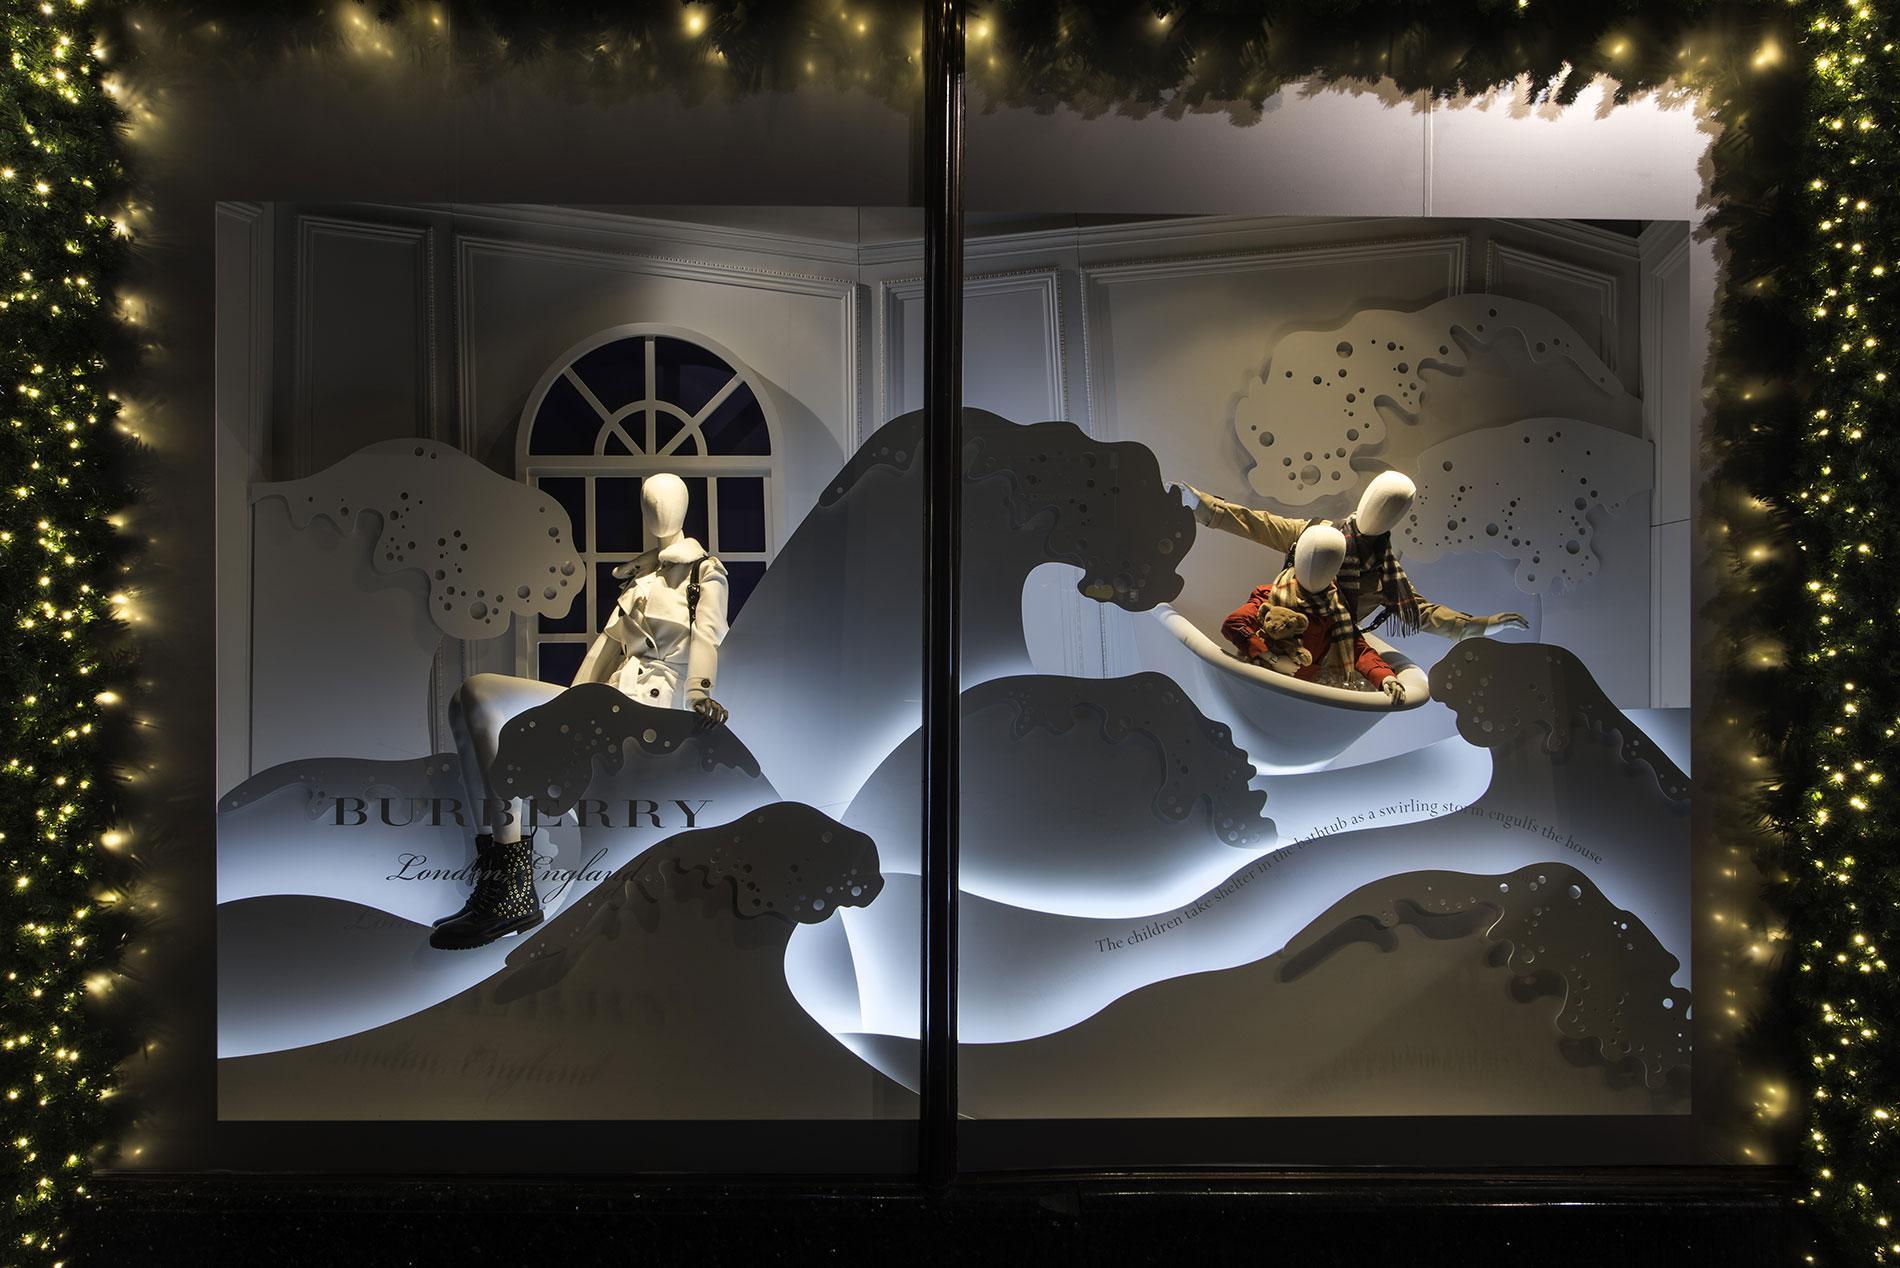 Image Vitrine Noel.Les Plus Belles Vitrines De Noel 2016 Madame Figaro